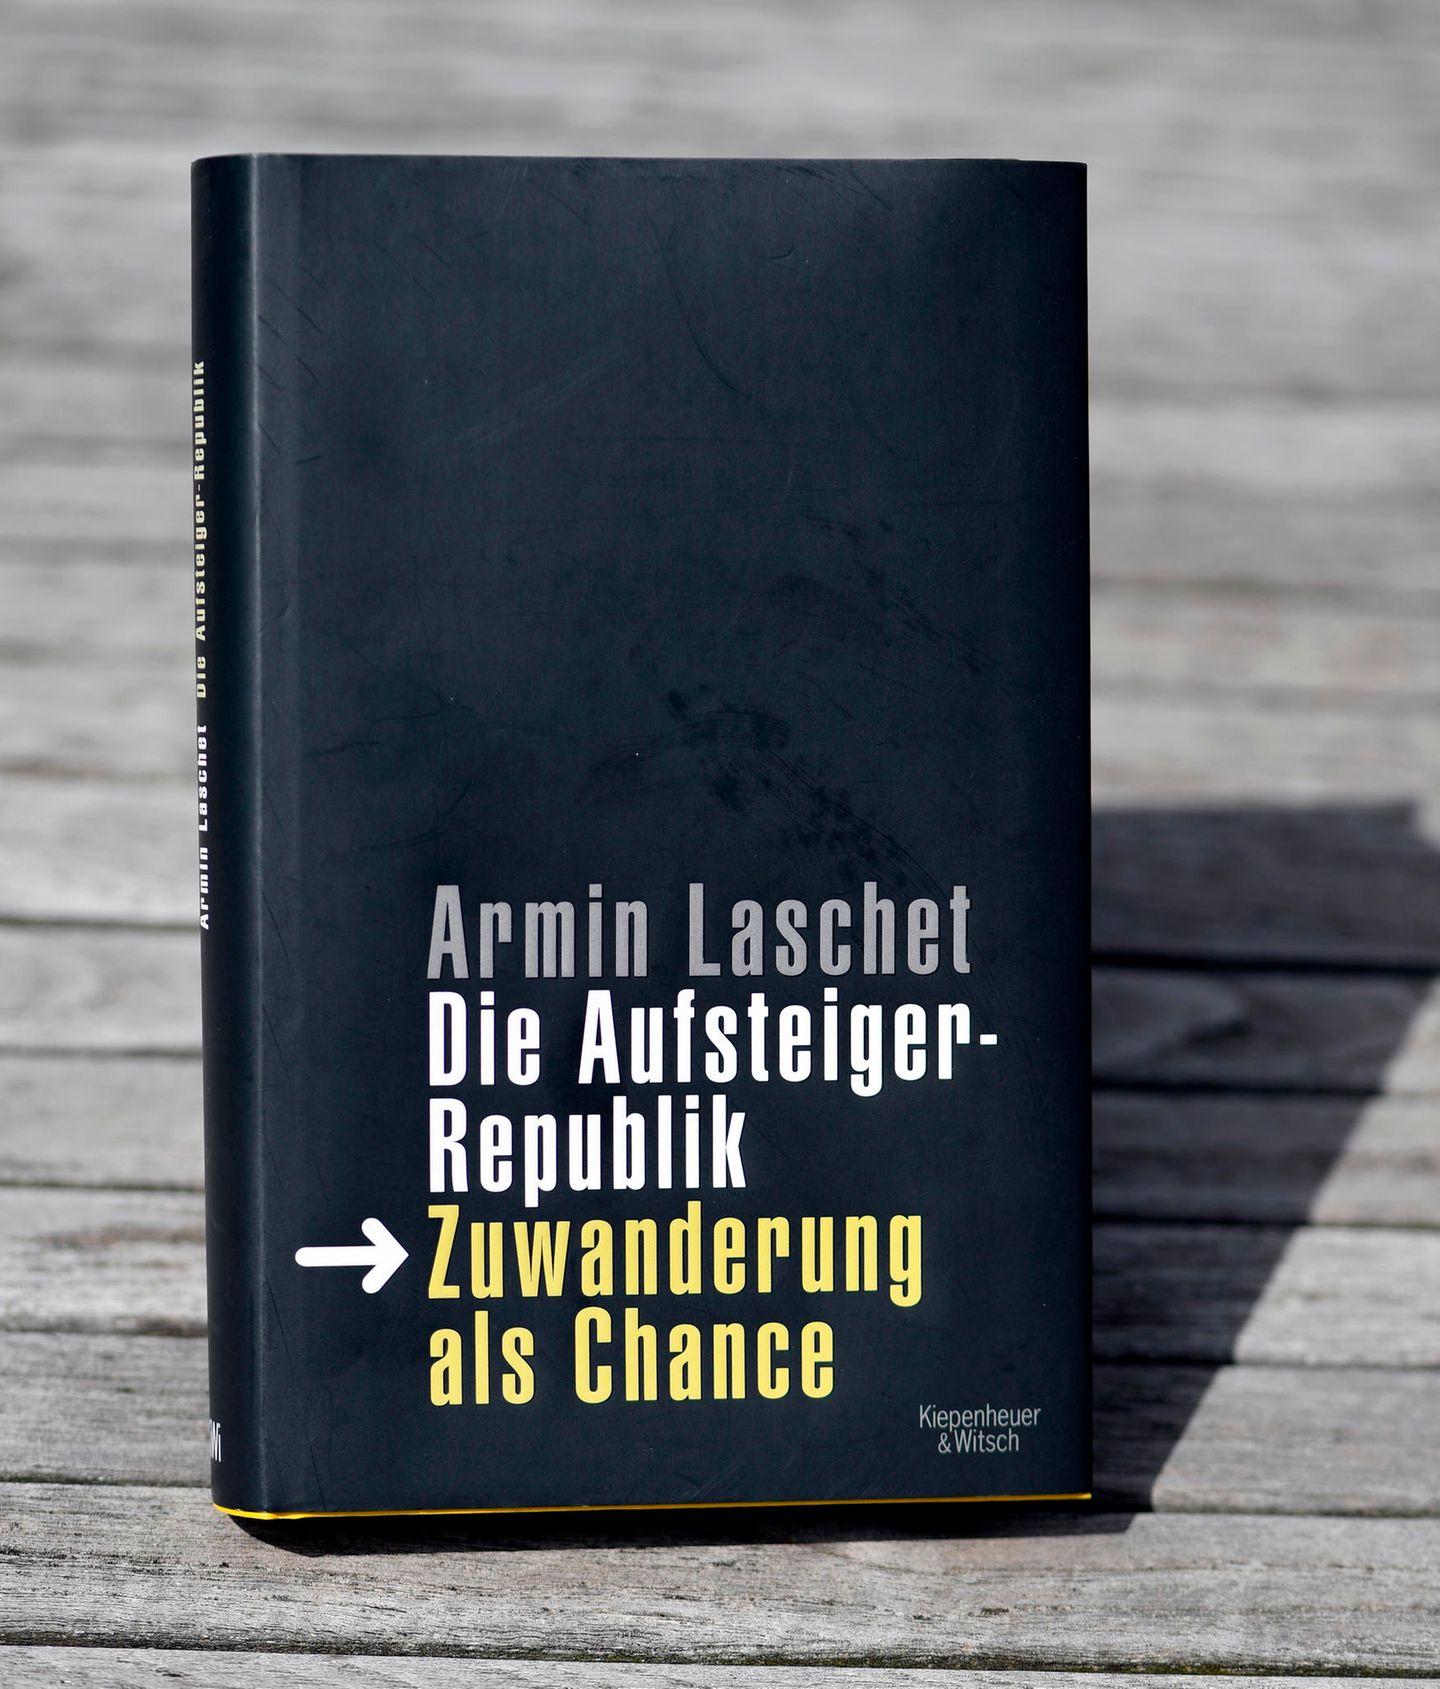 Medienwissenschaftler hält an Plagiatsvorwürfen gegen Kanzlerkandidat Armin Laschet fest